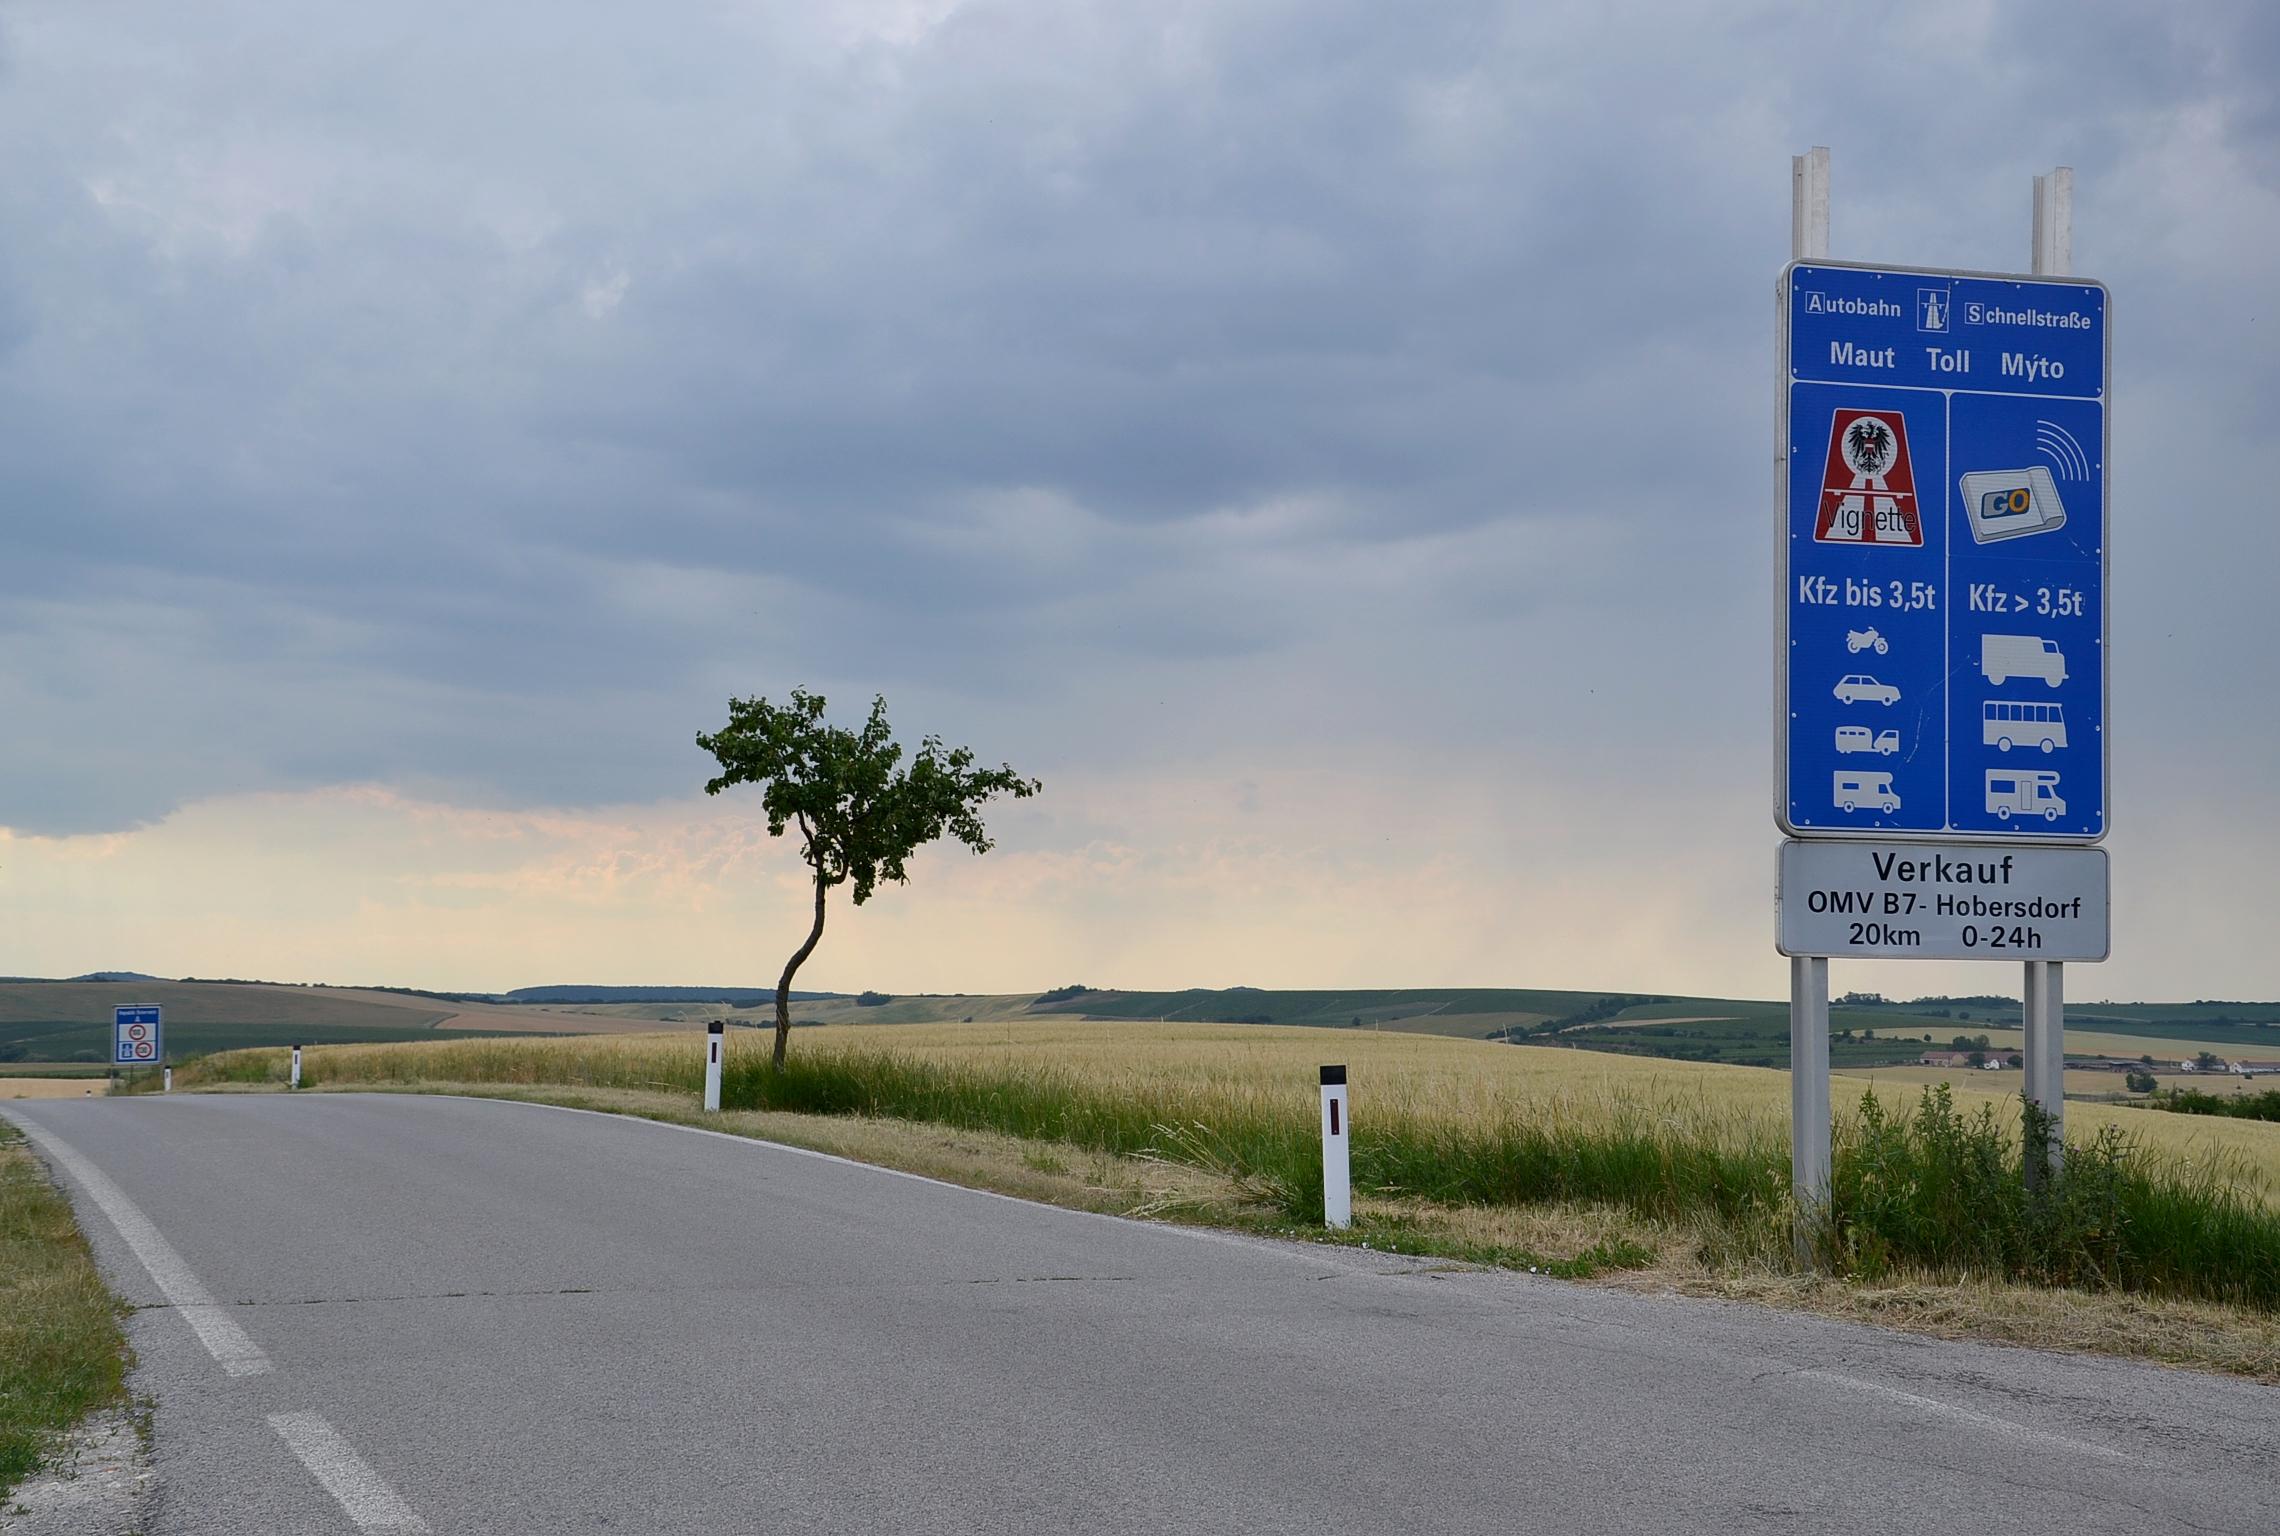 https://upload.wikimedia.org/wikipedia/commons/c/c3/Border_Austria-Czech_Republic_%28Schrattenberg_-_Valtice%29.JPG